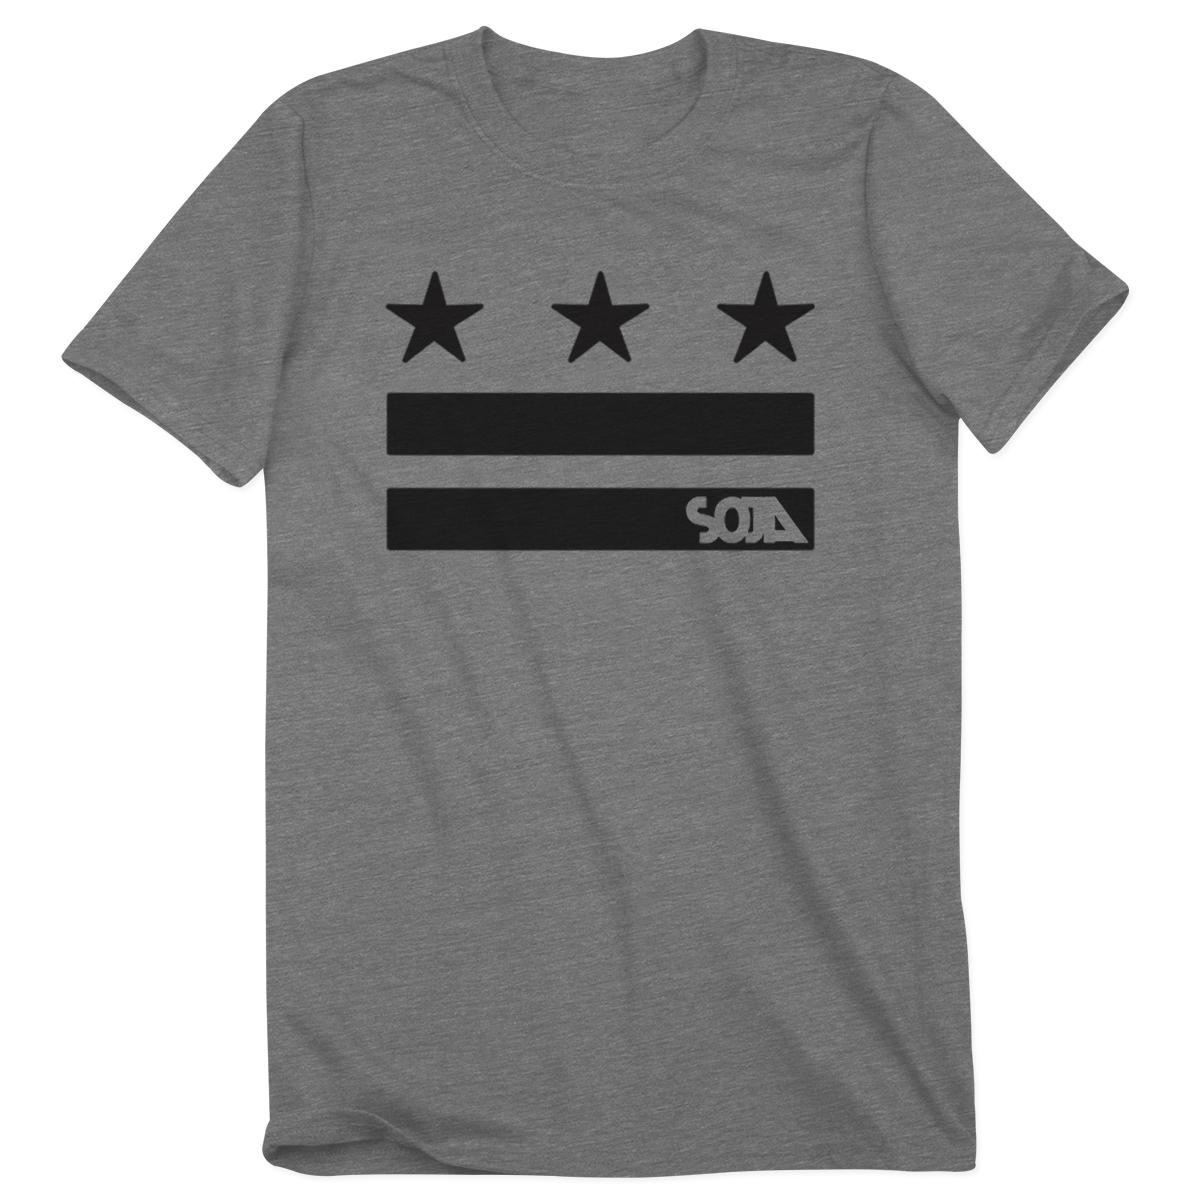 Stars & Stripes Logo Cut Out Heather Grey Tee